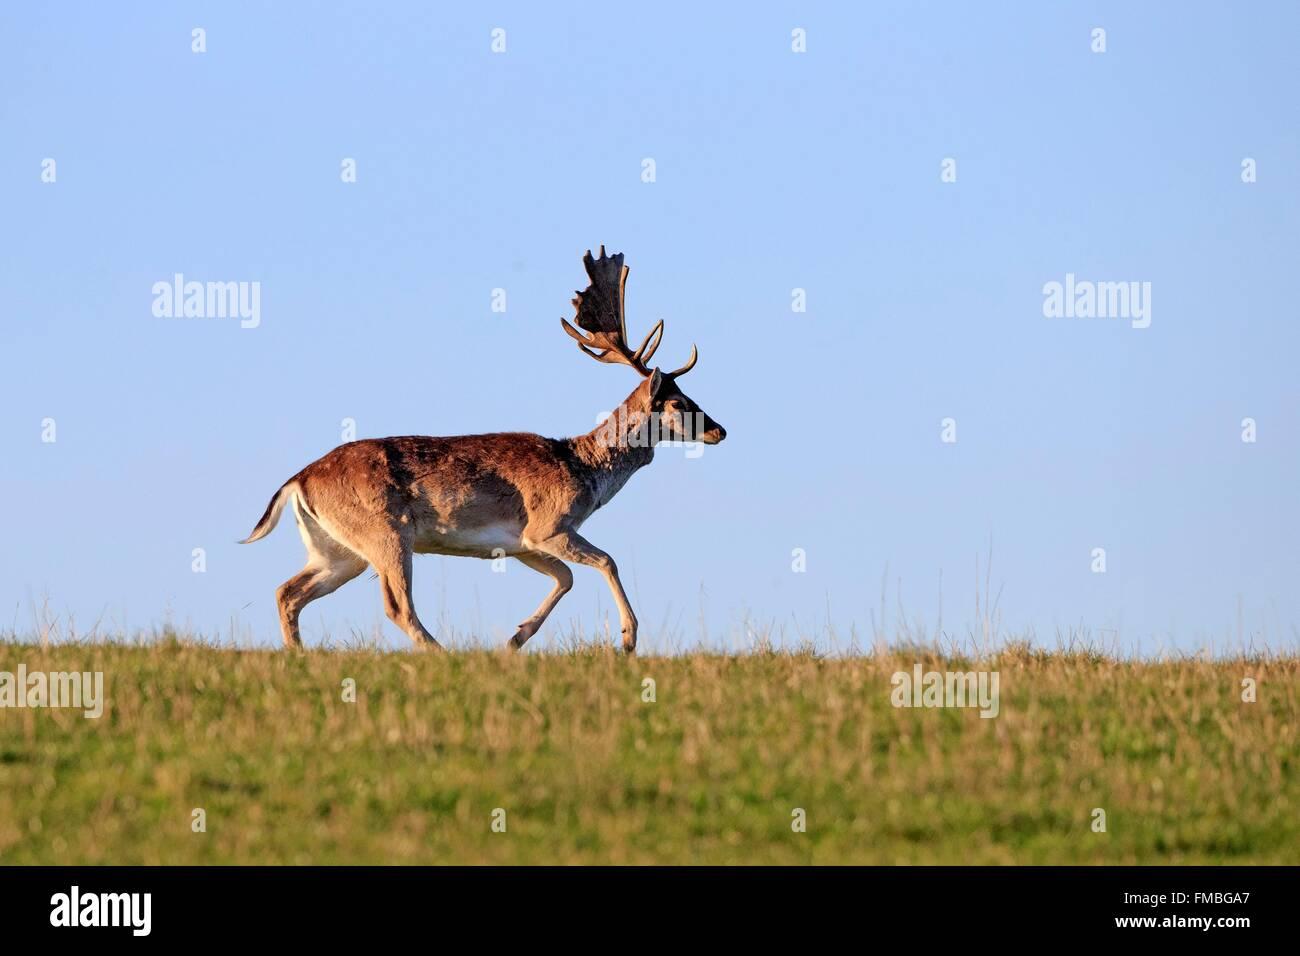 France, Haute Saone, Private park, Fallow Deer (Dama dama), buck, male - Stock Image